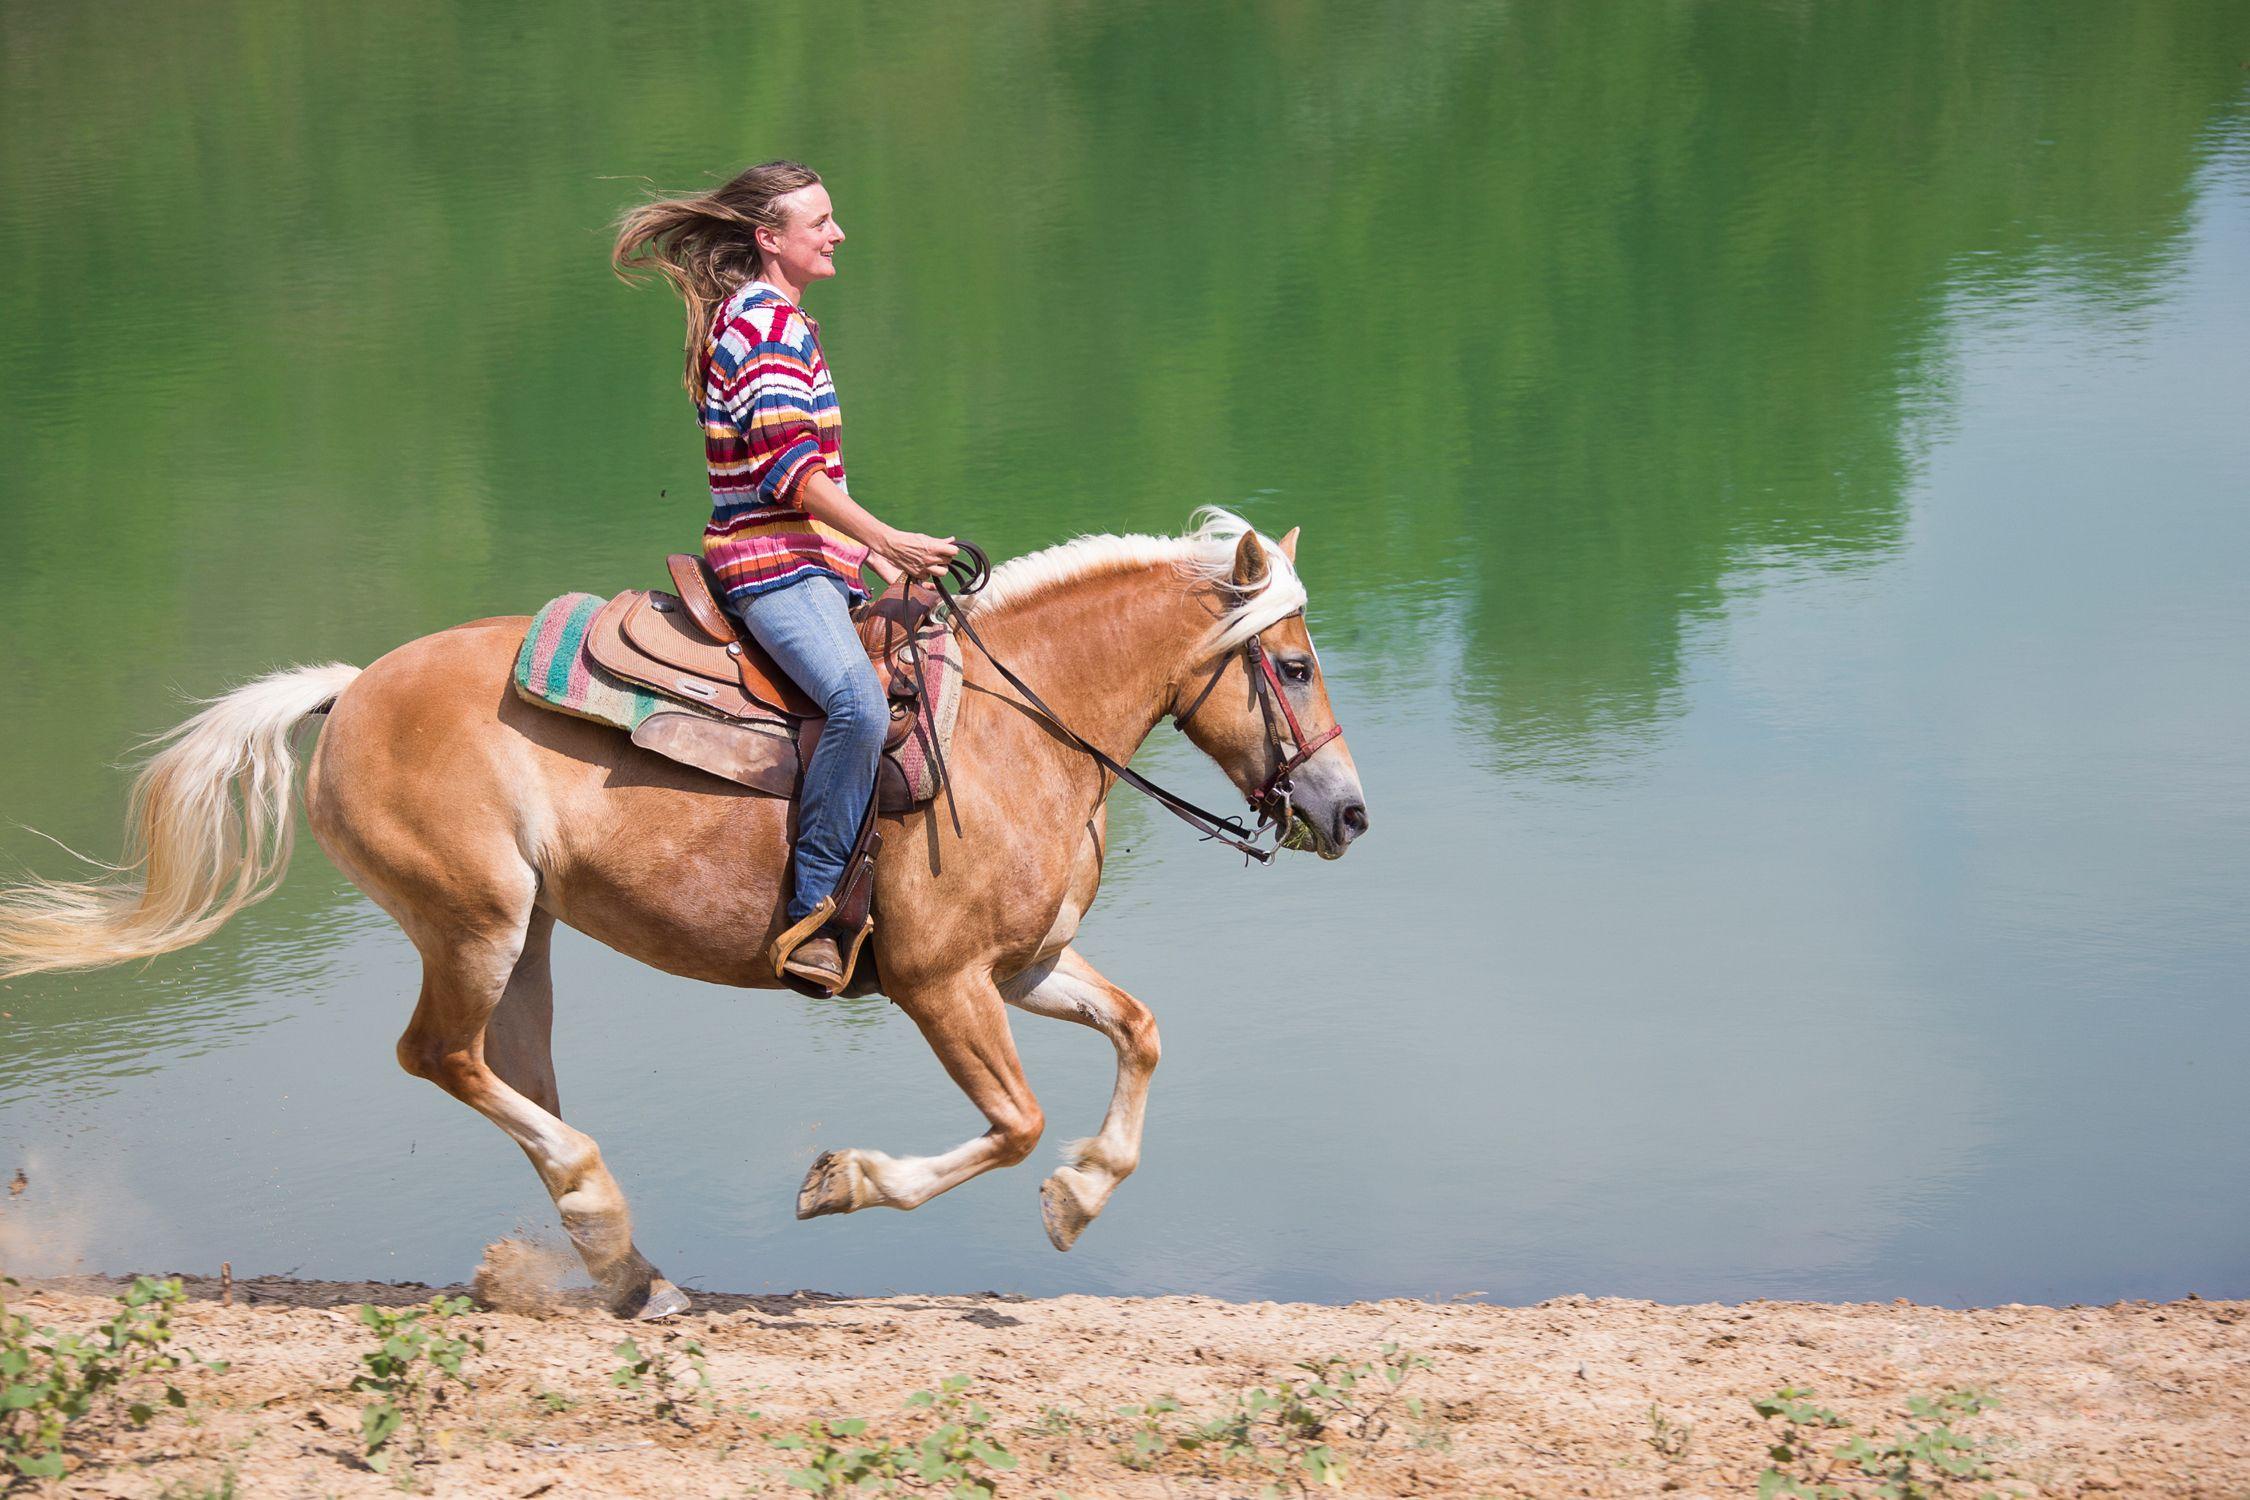 Horse rider wallpaper - photo#32